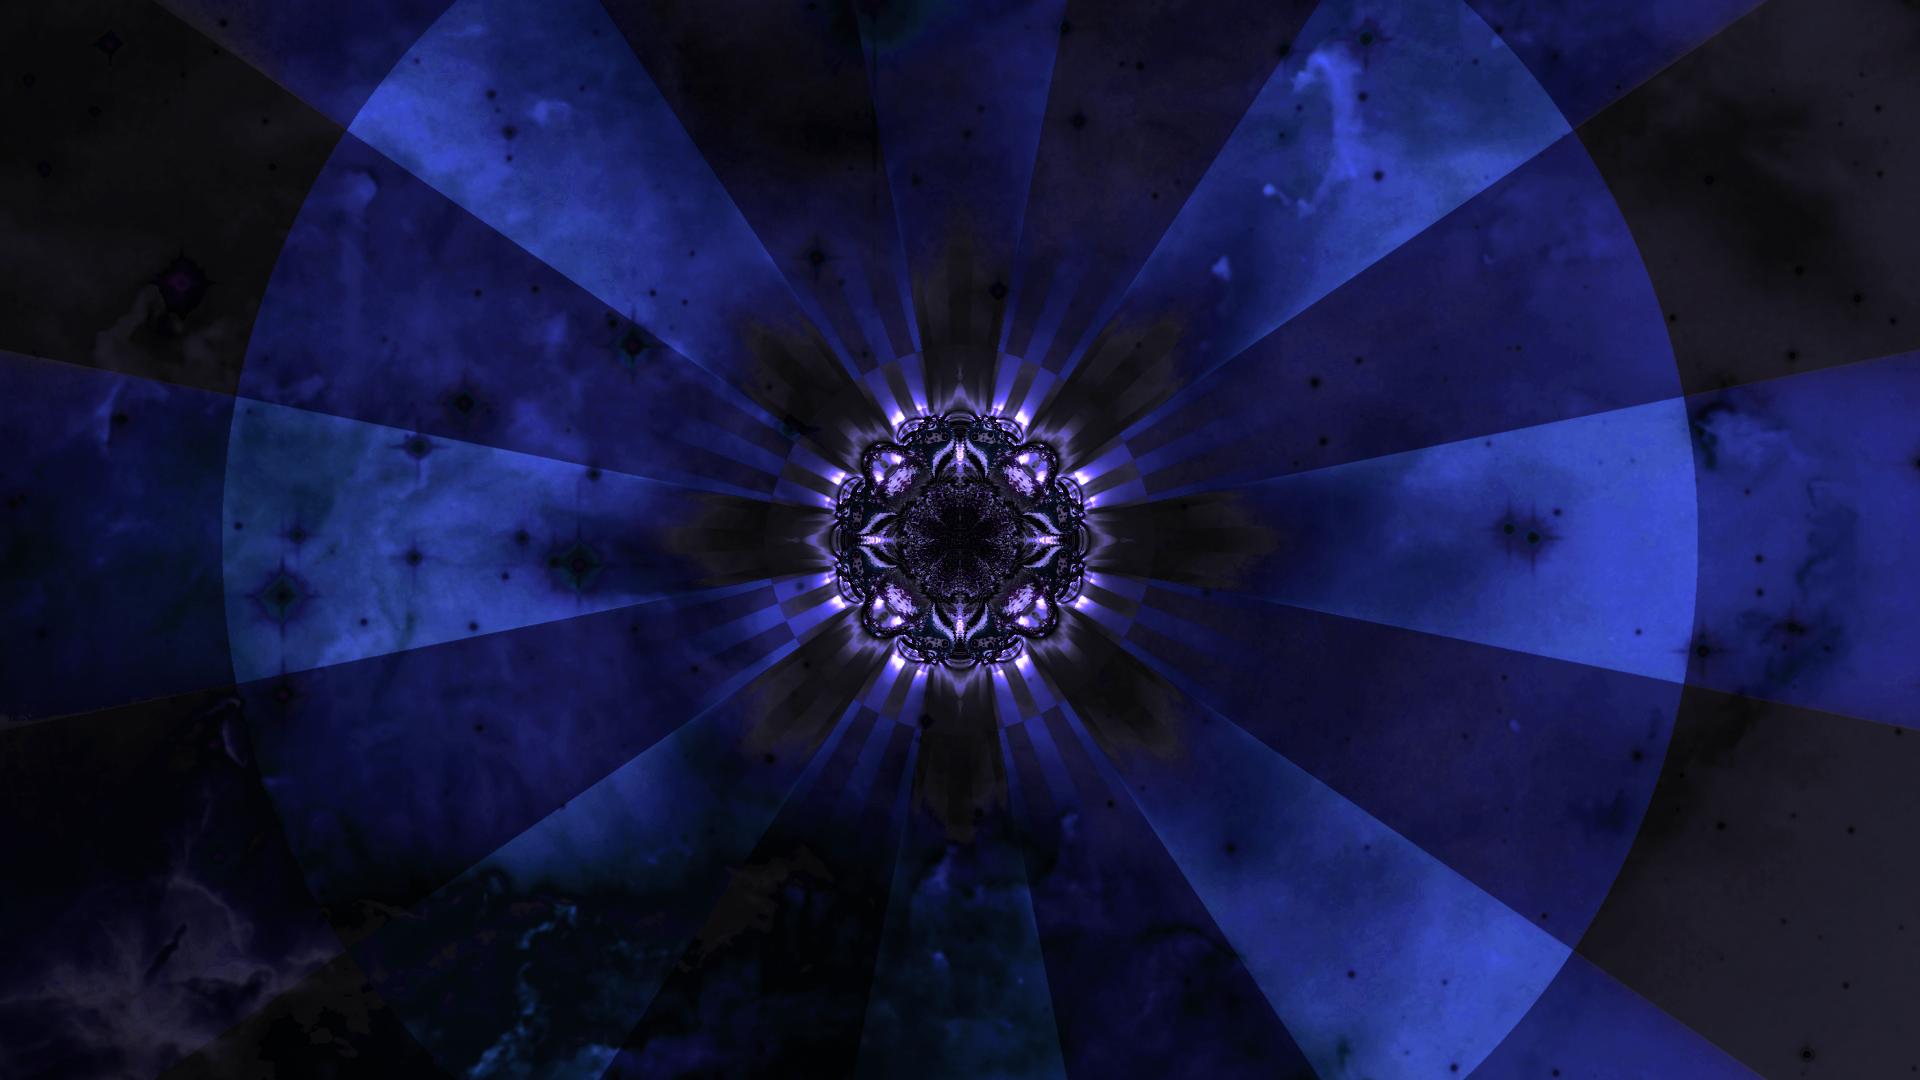 Space Fractal 36 by saintabyssal on deviantART  Fractals In Space